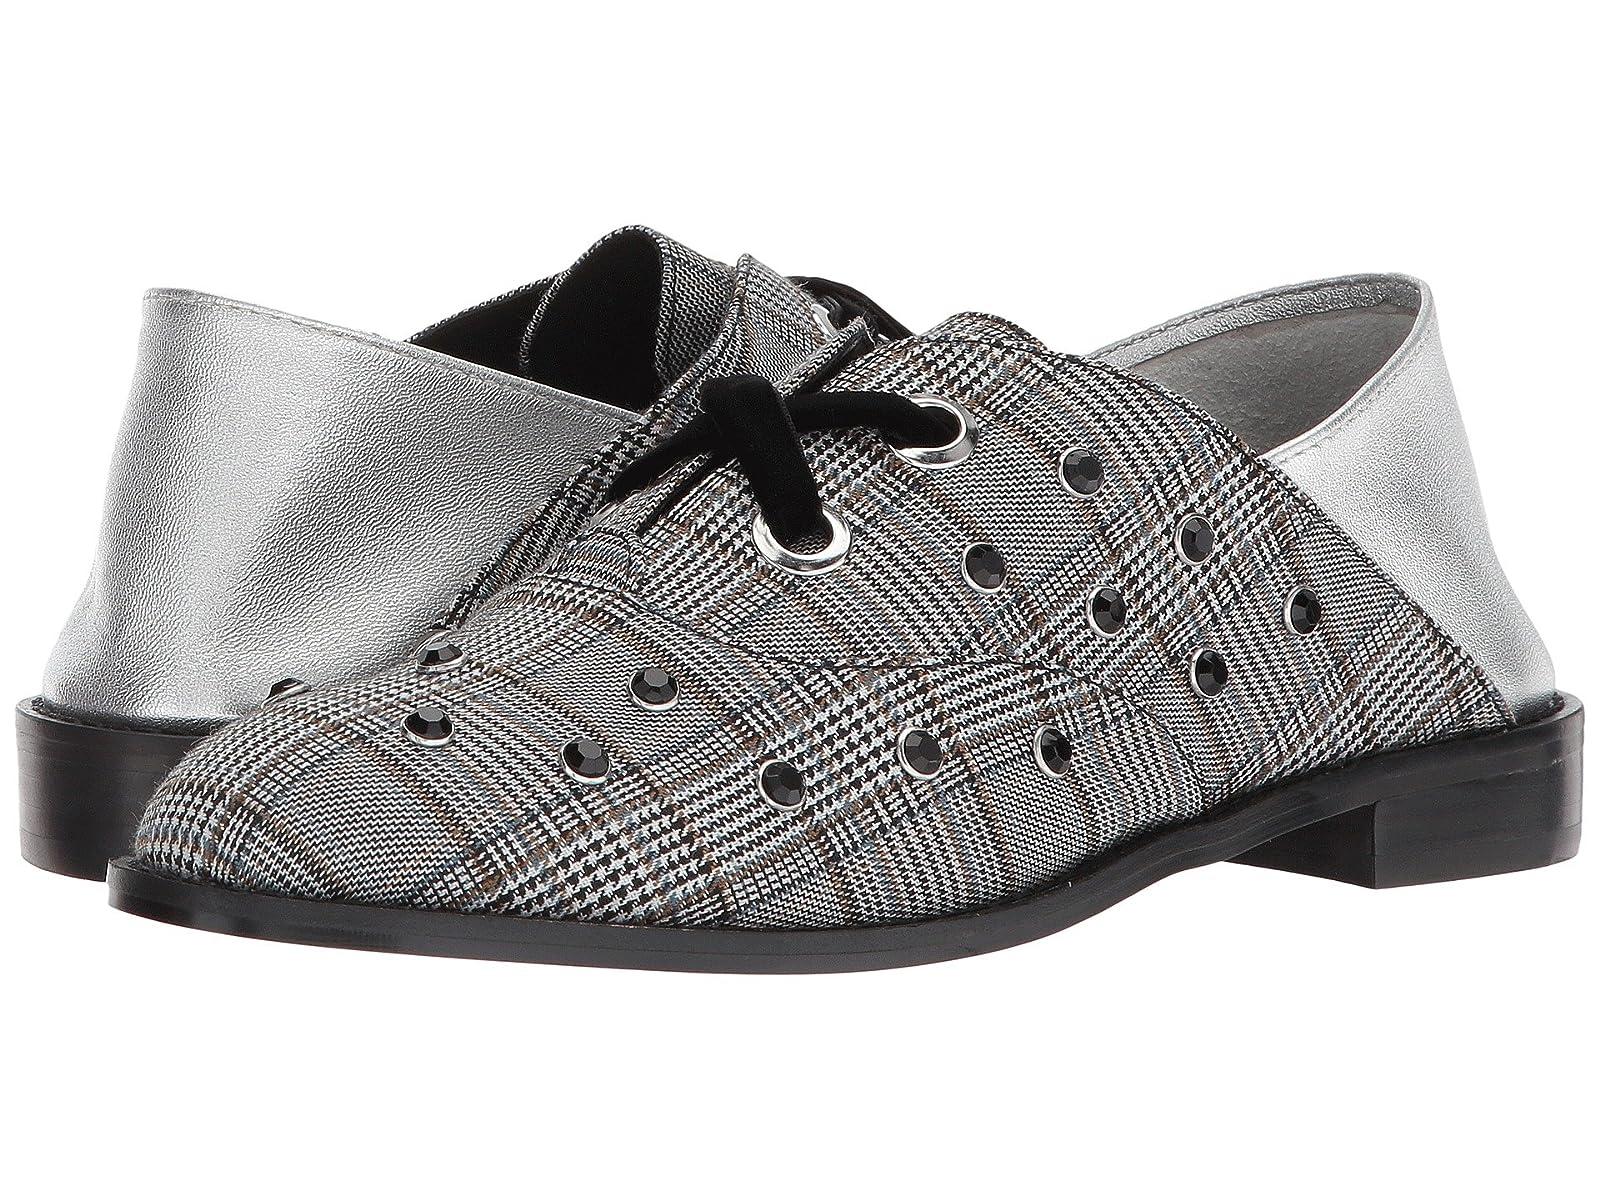 Shellys London HankieCheap and distinctive eye-catching shoes